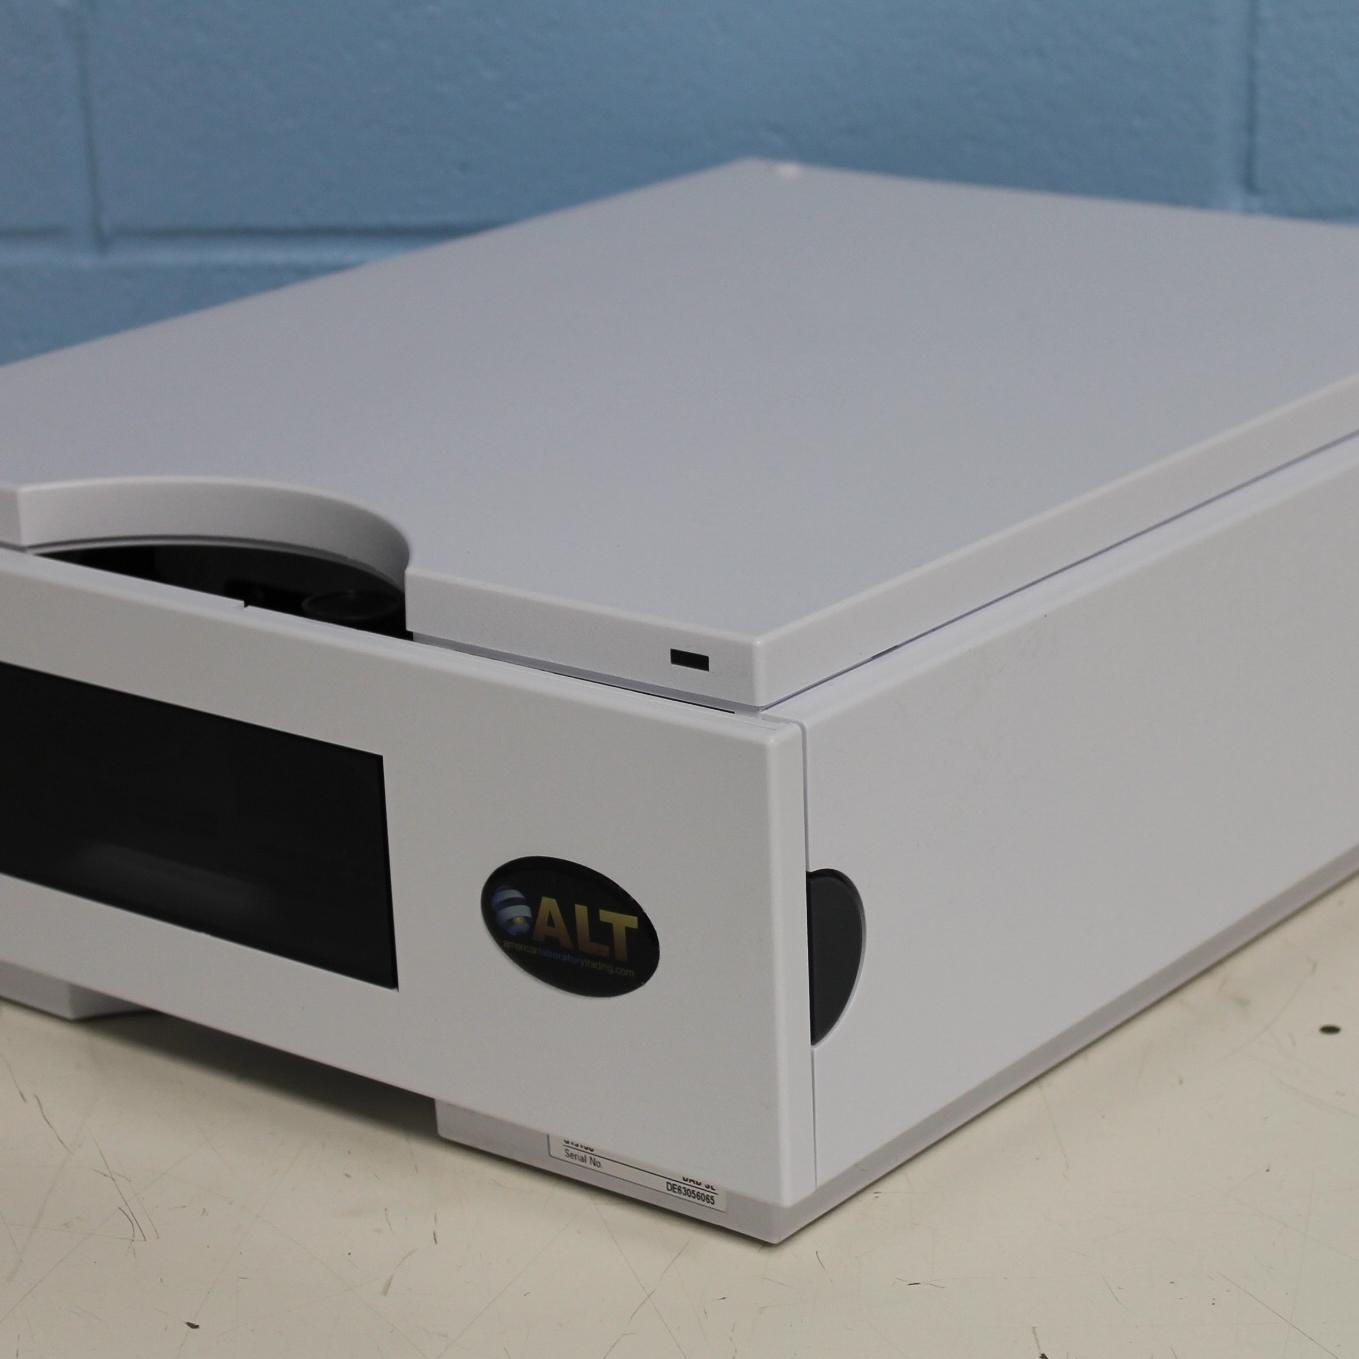 Agilent Technologies 1200 Series G1315C DAD SL Image